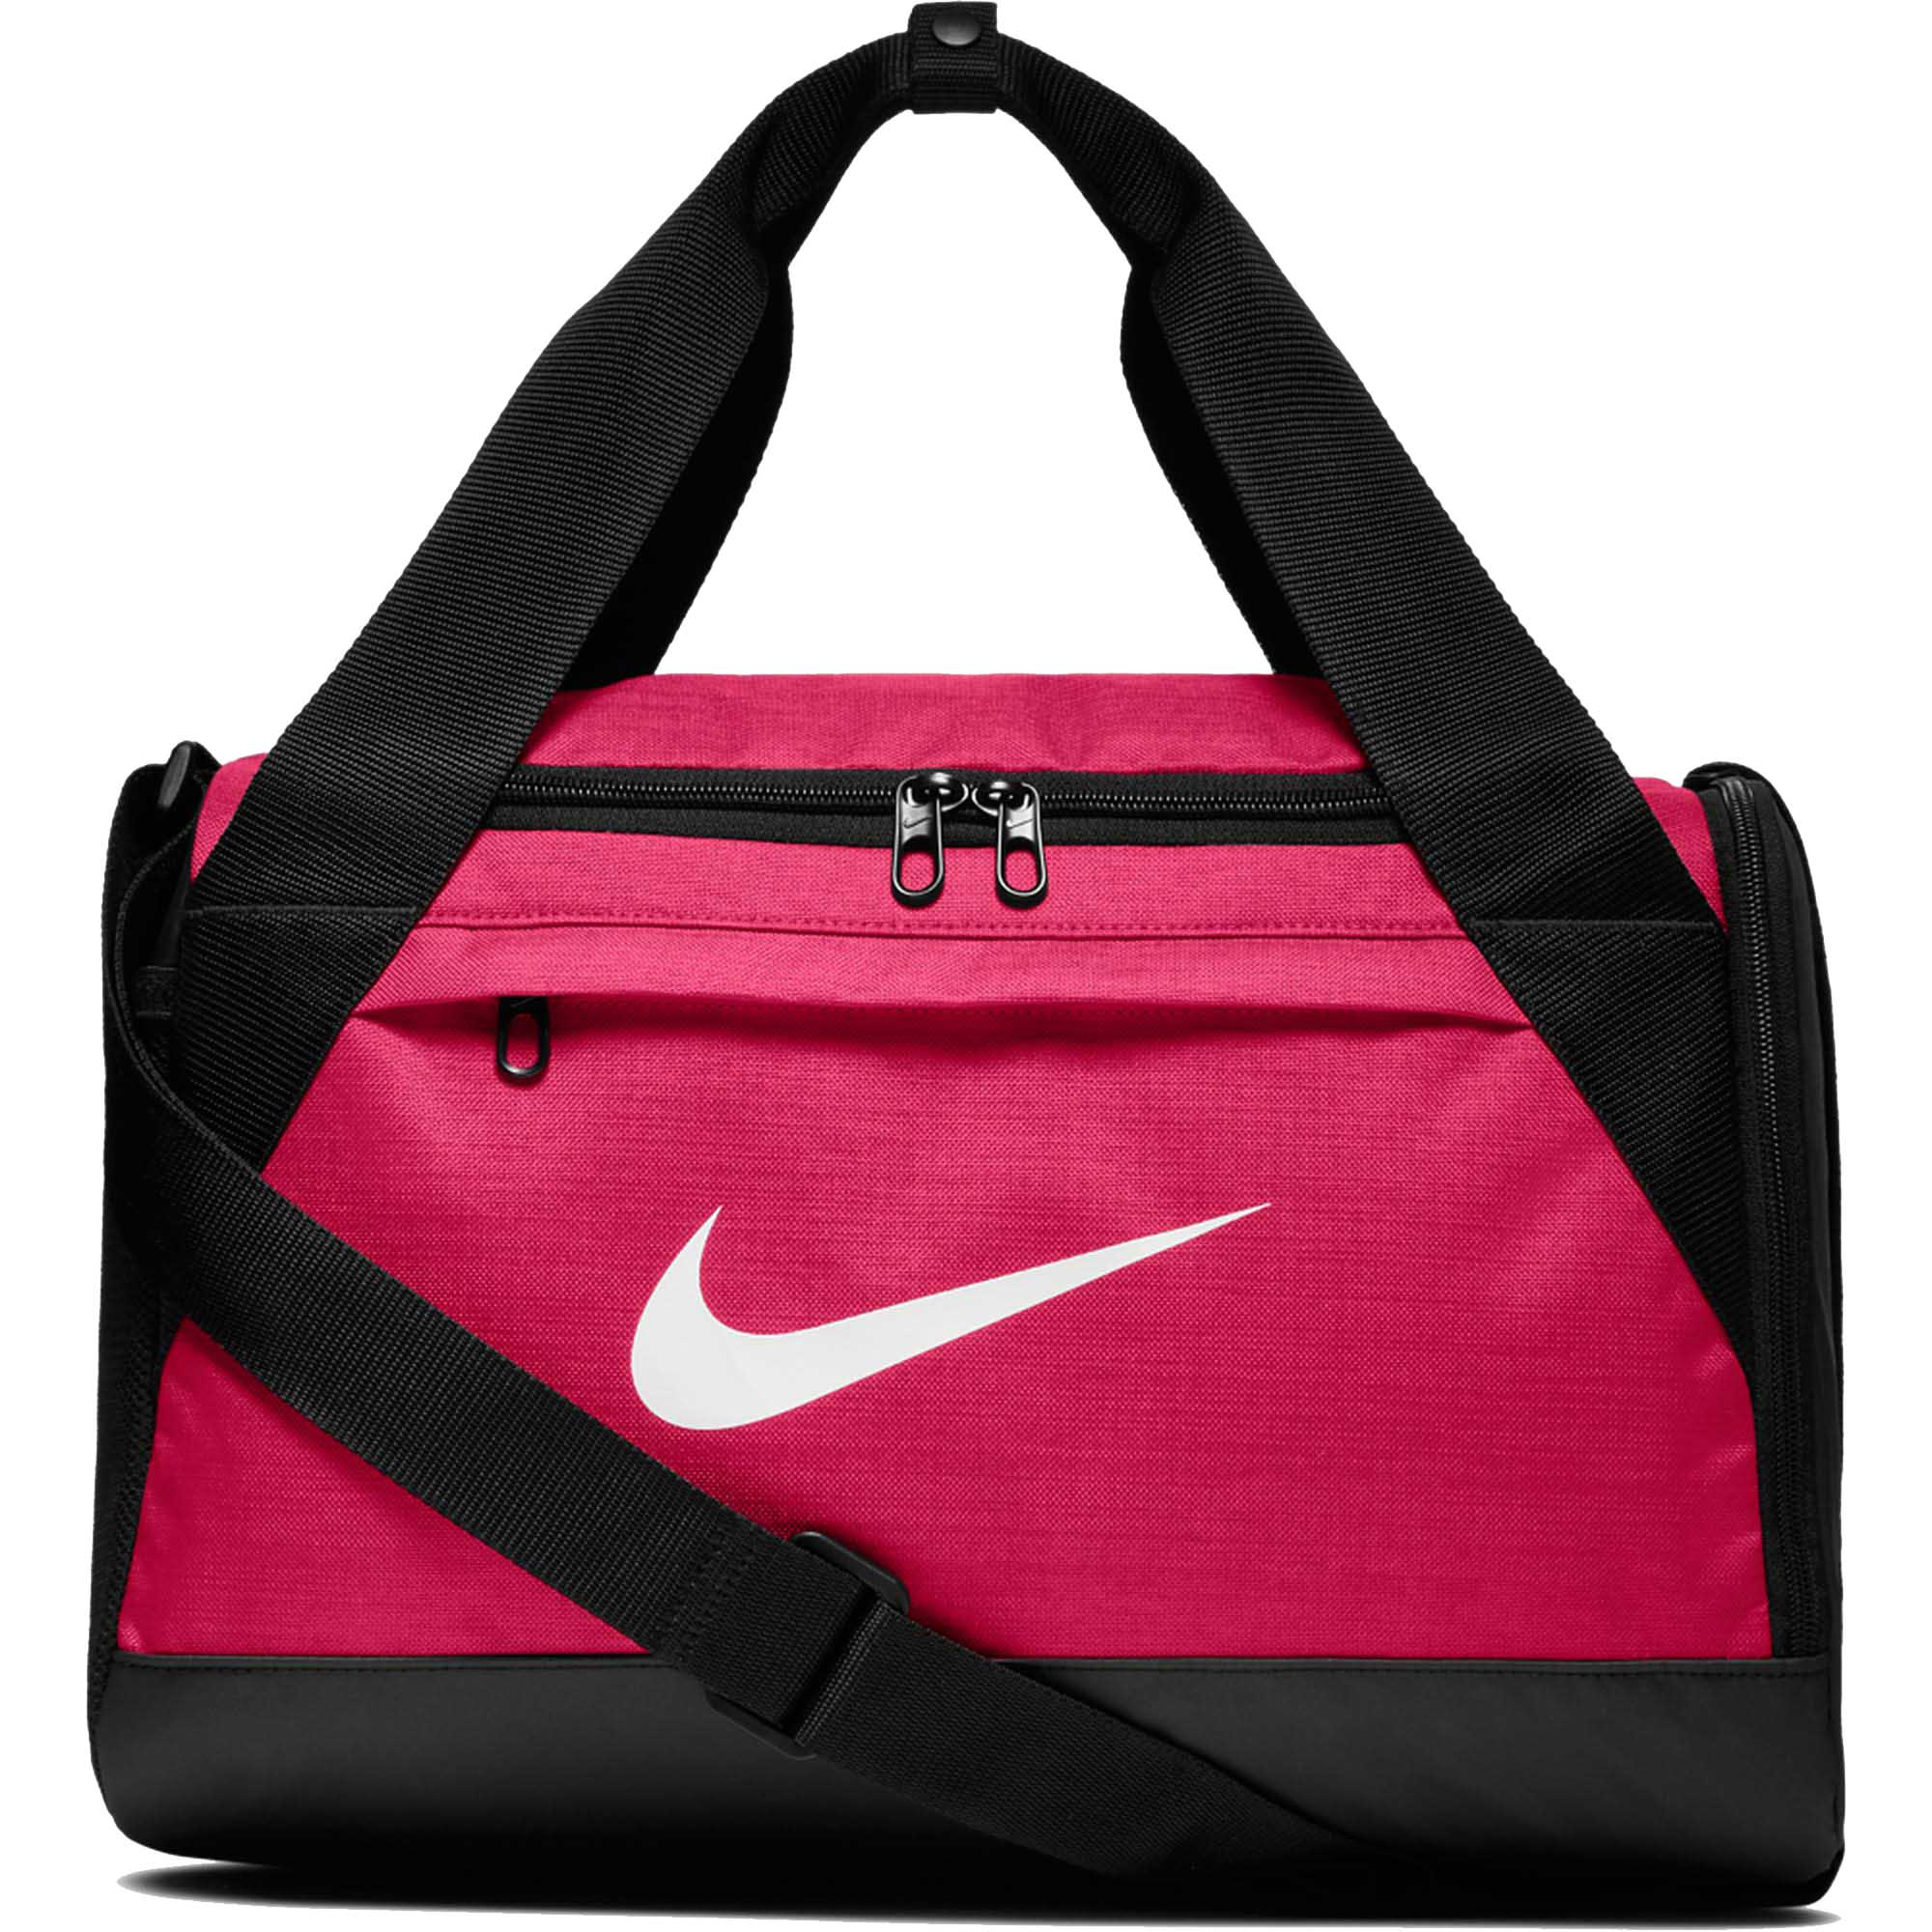 Bolsa Nike Brasilia Duffel Small 25L Rosa/Preta  - REAL ESPORTE